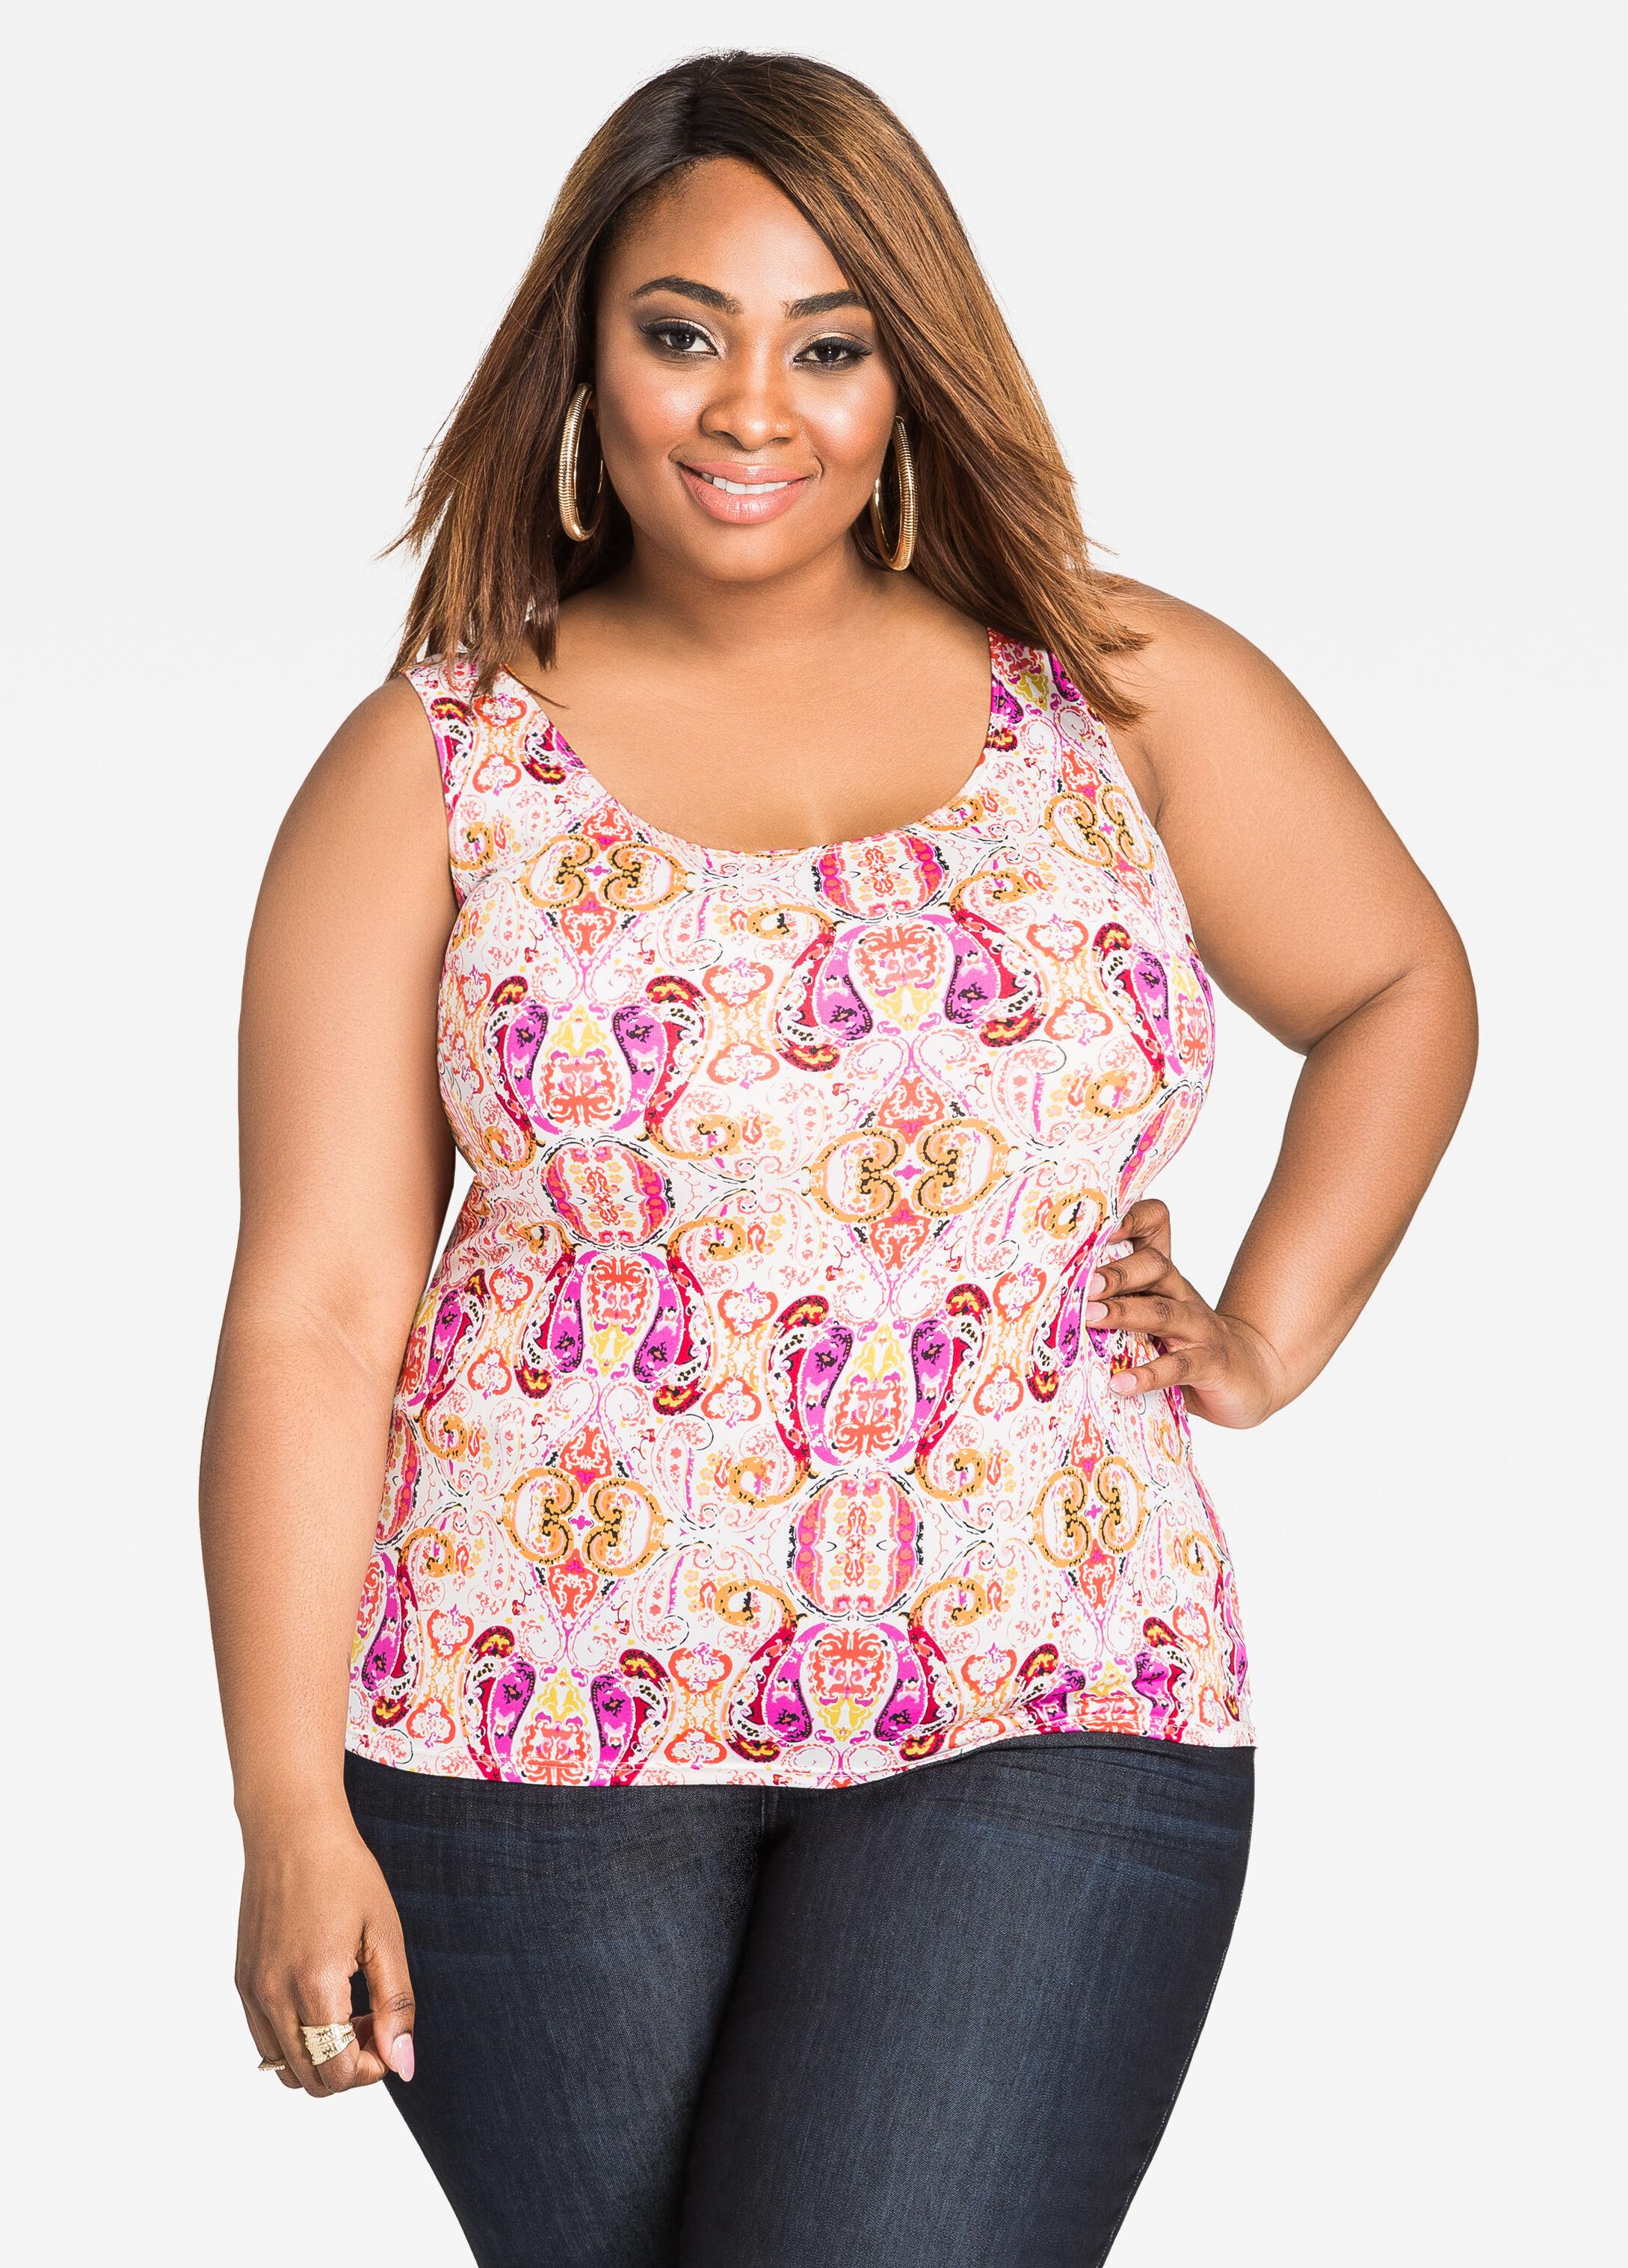 Trendy Plus-Size Tops, Tunics, Shirts & Tees   Sizes 12 - 32 ...